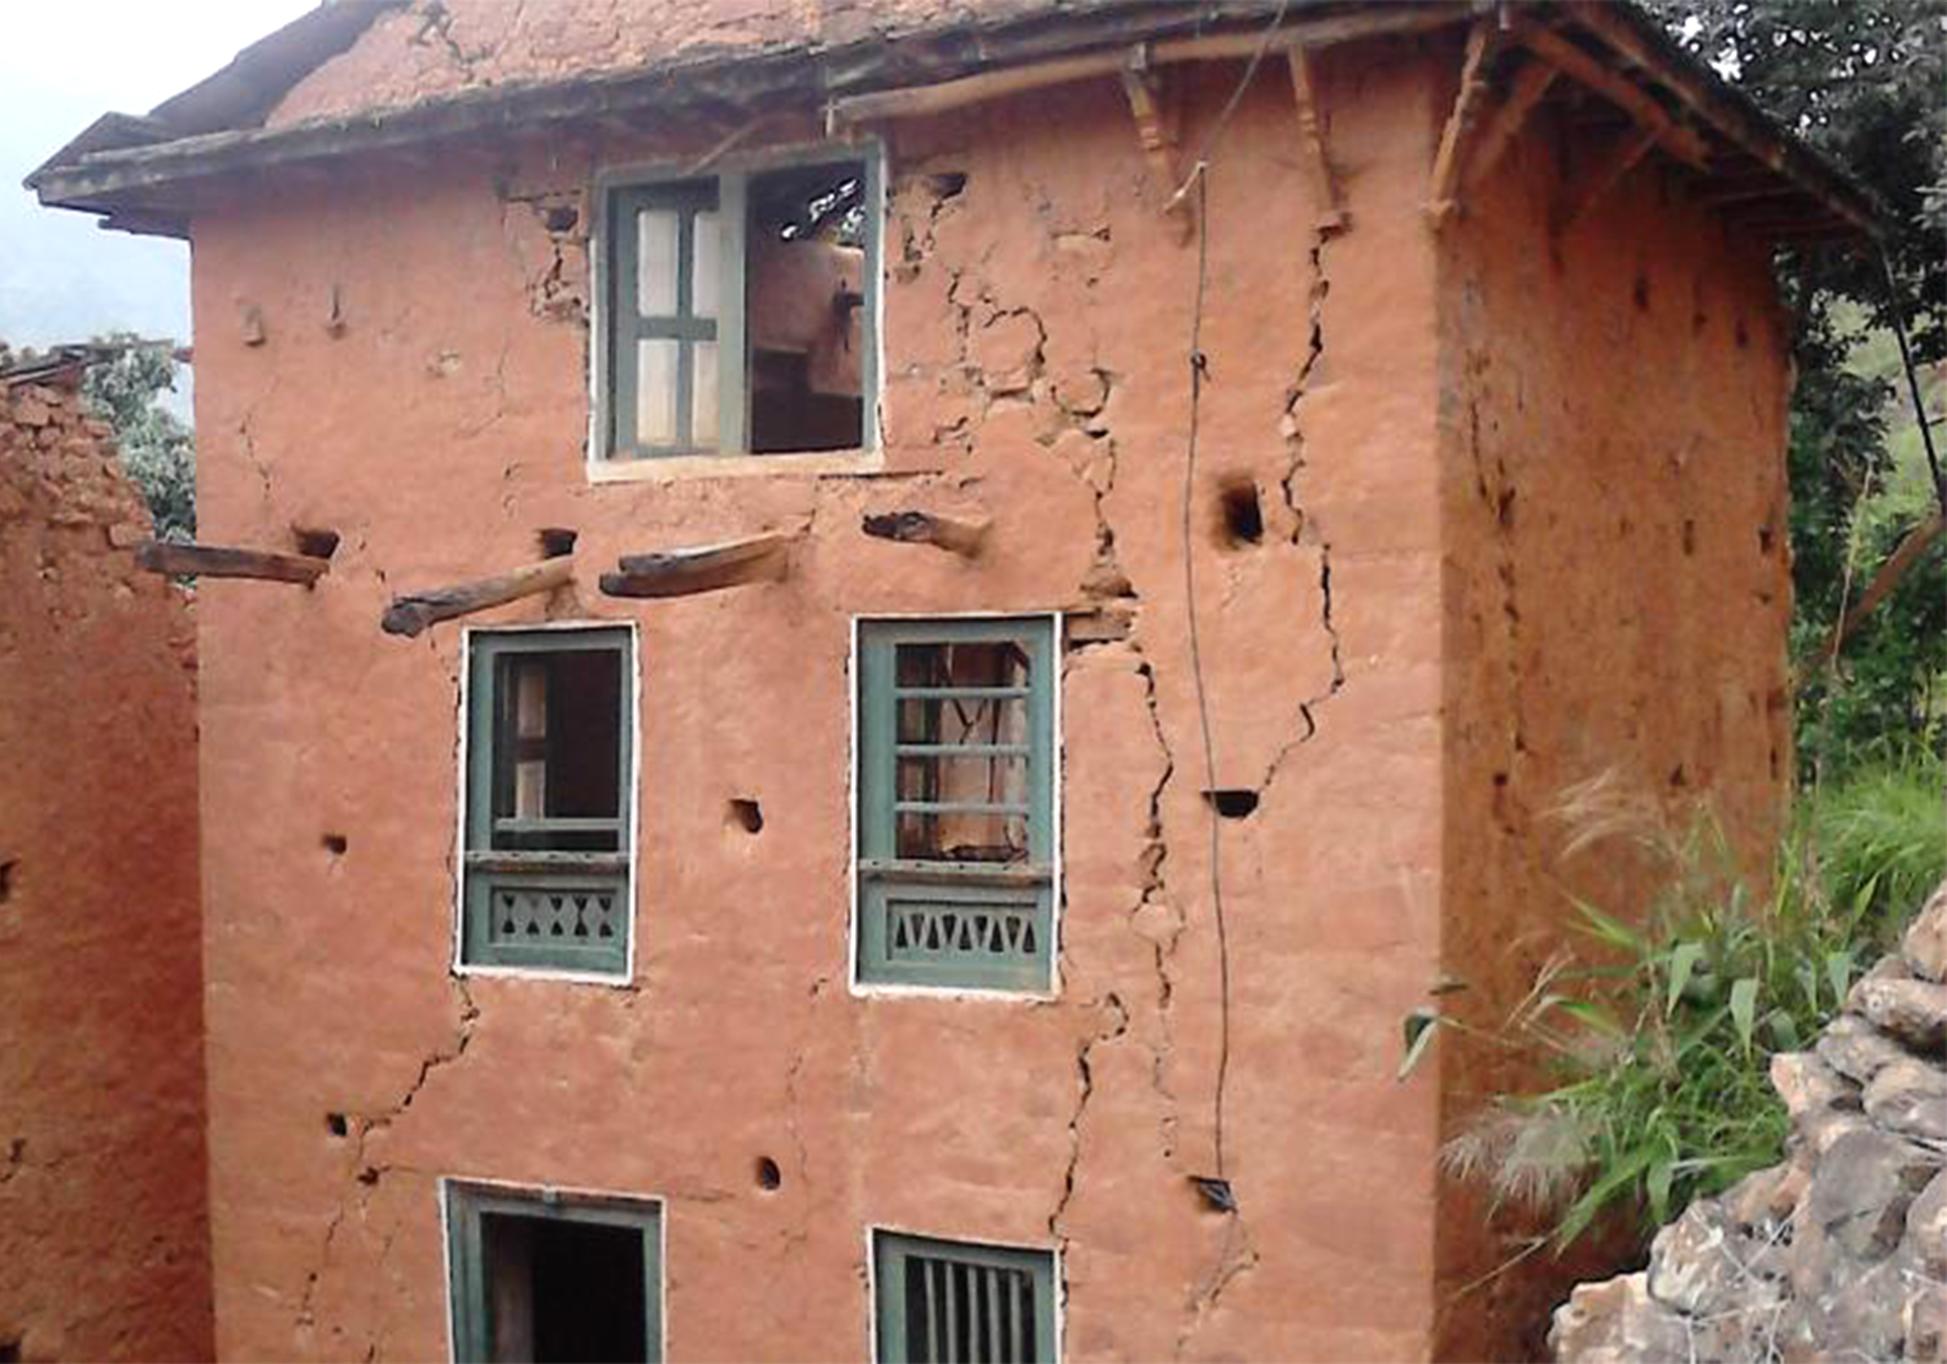 Nepal - Broken house 1.png